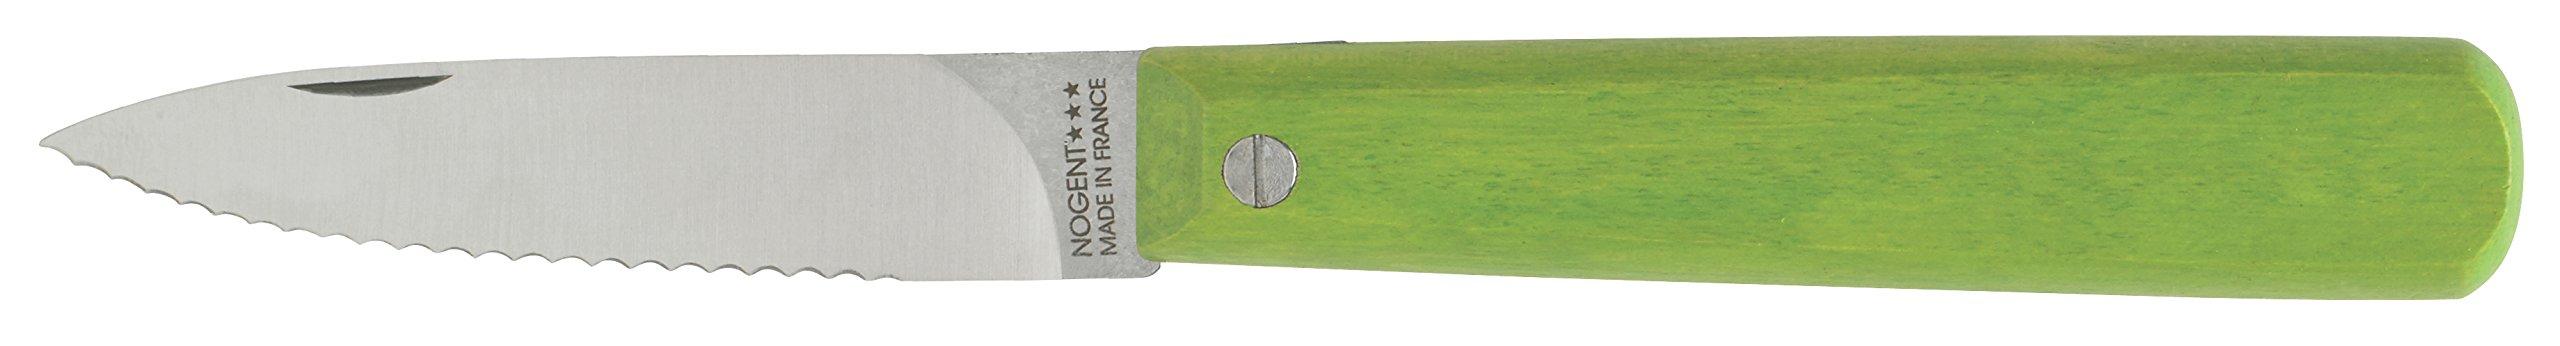 Nogent Le Pocket Folding Paring Kitchen Knife, Made in France, Serrated Edge, Hardwood Handle, Lime Green, 3.15-Inch Carbon Steel Blade